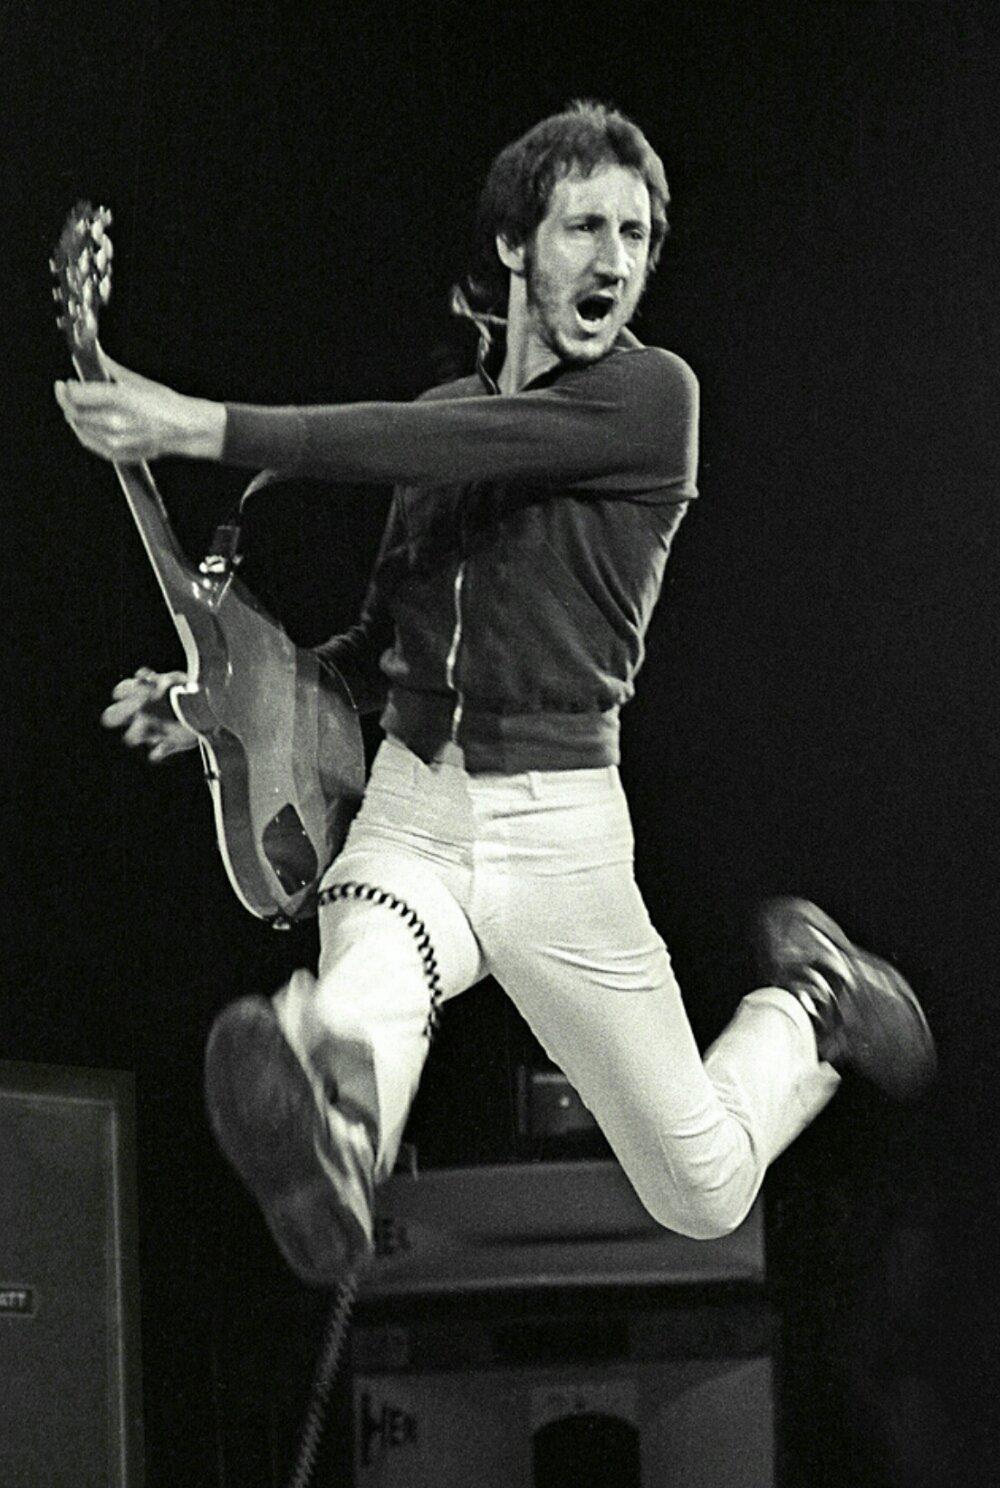 Happy birthday to the man ....Pete Townshend!!